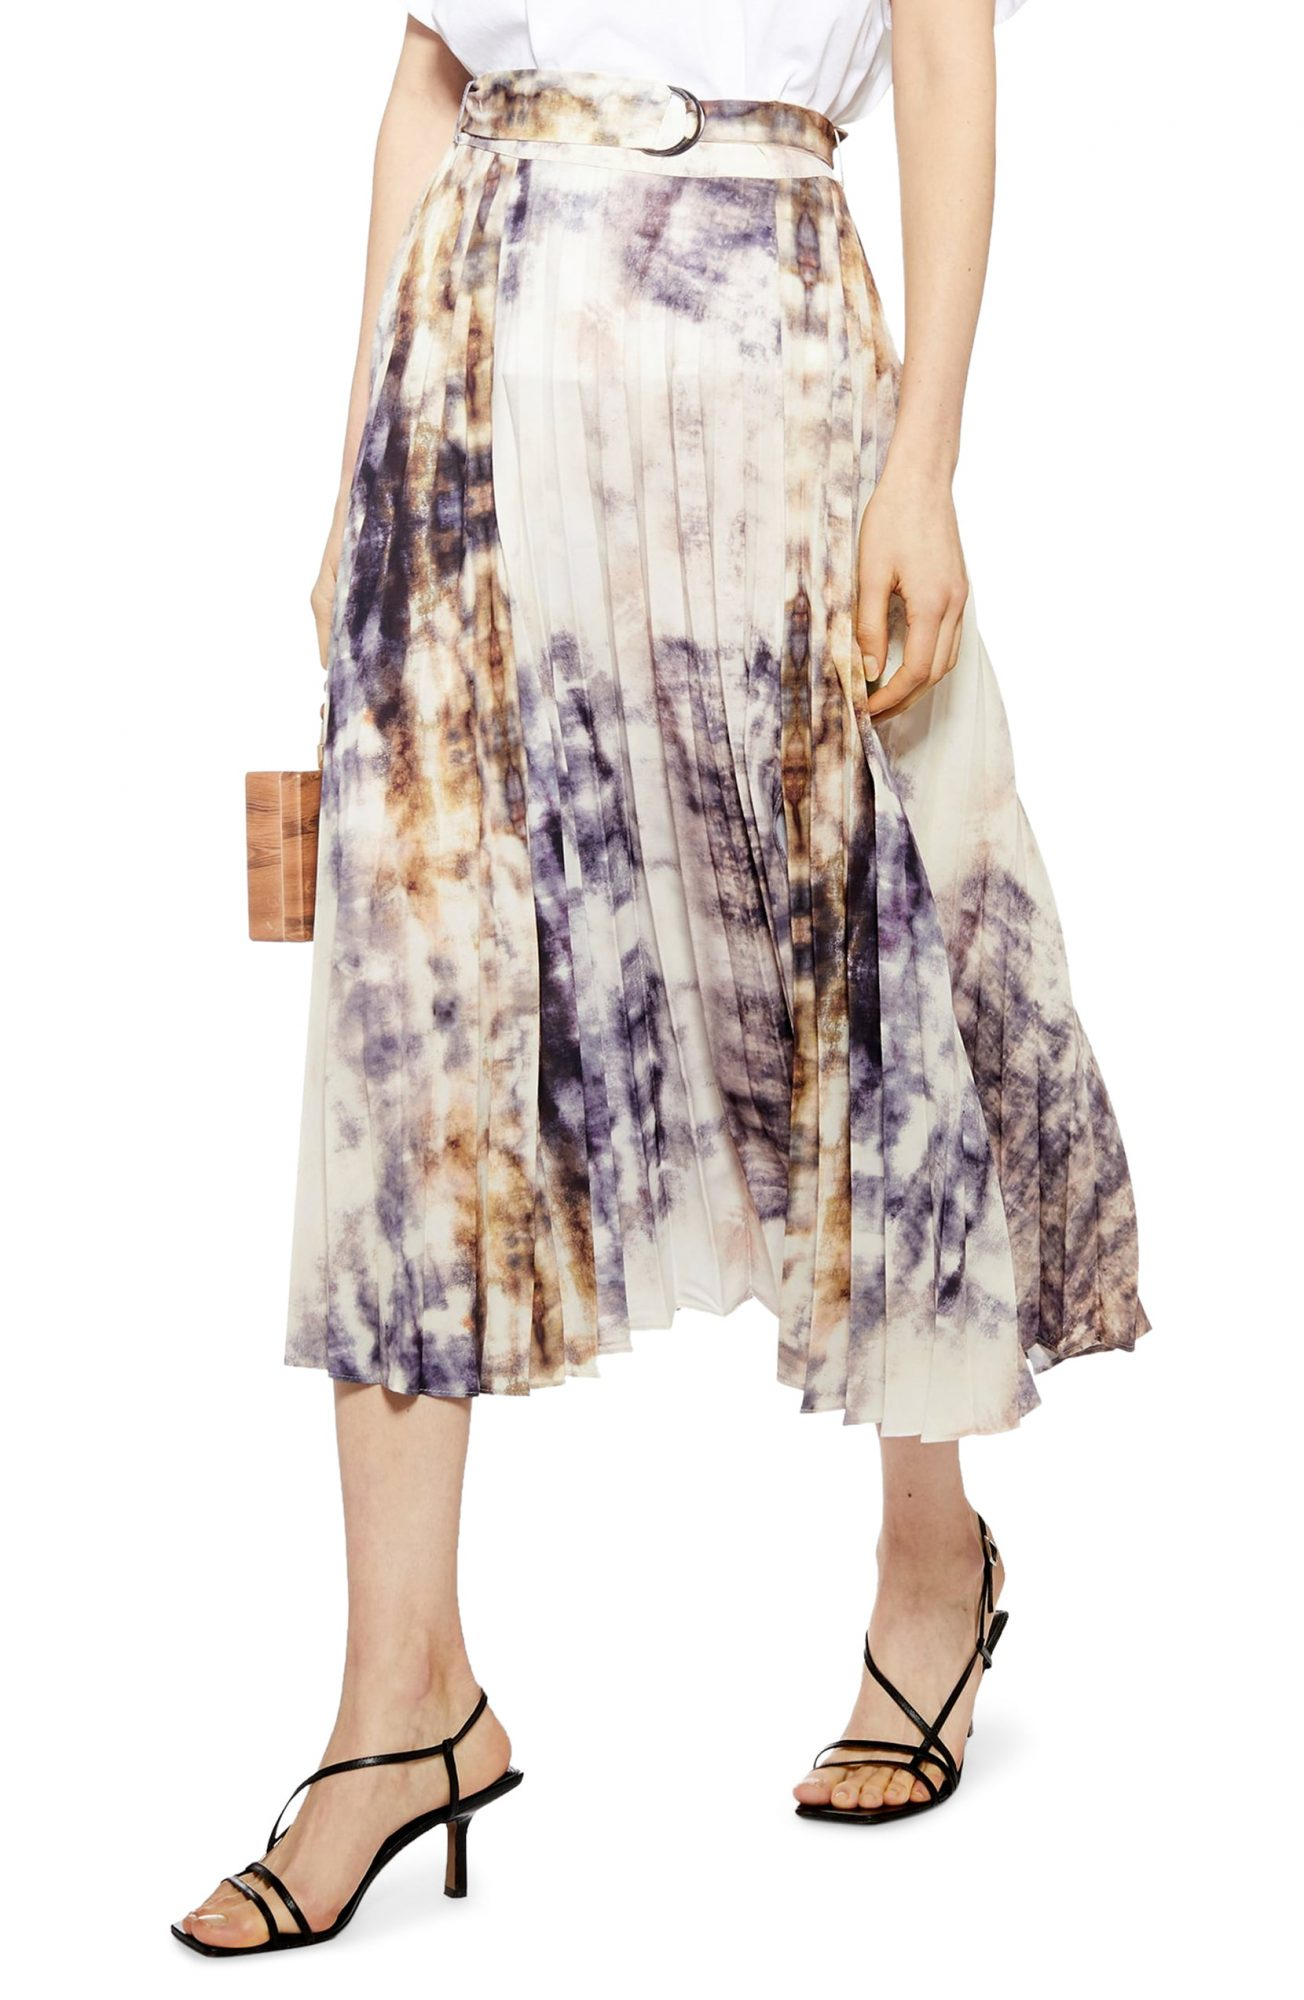 Topshop tie-dye midi skirt